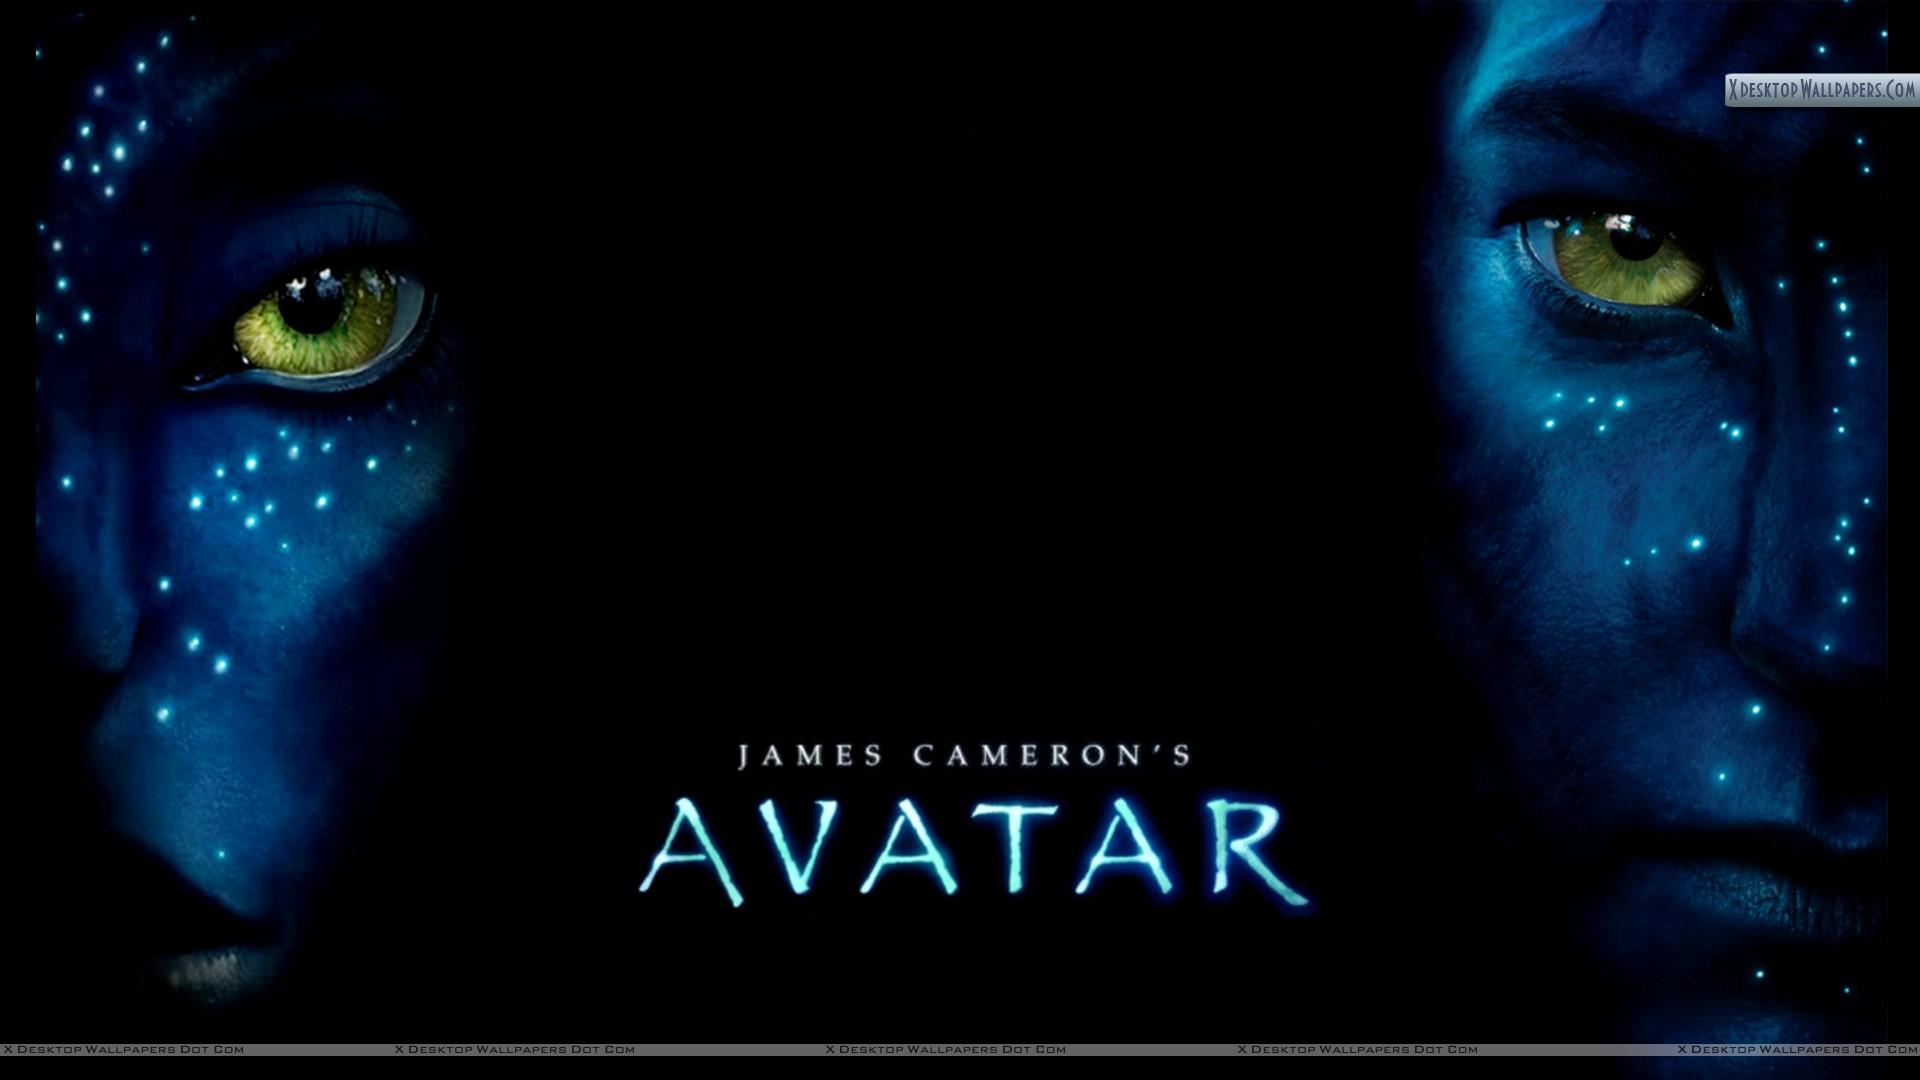 12449 Woodsprite <b>Avatar</b> 1920x1080 <b>Movie Wallpapers Desktop Background</b>